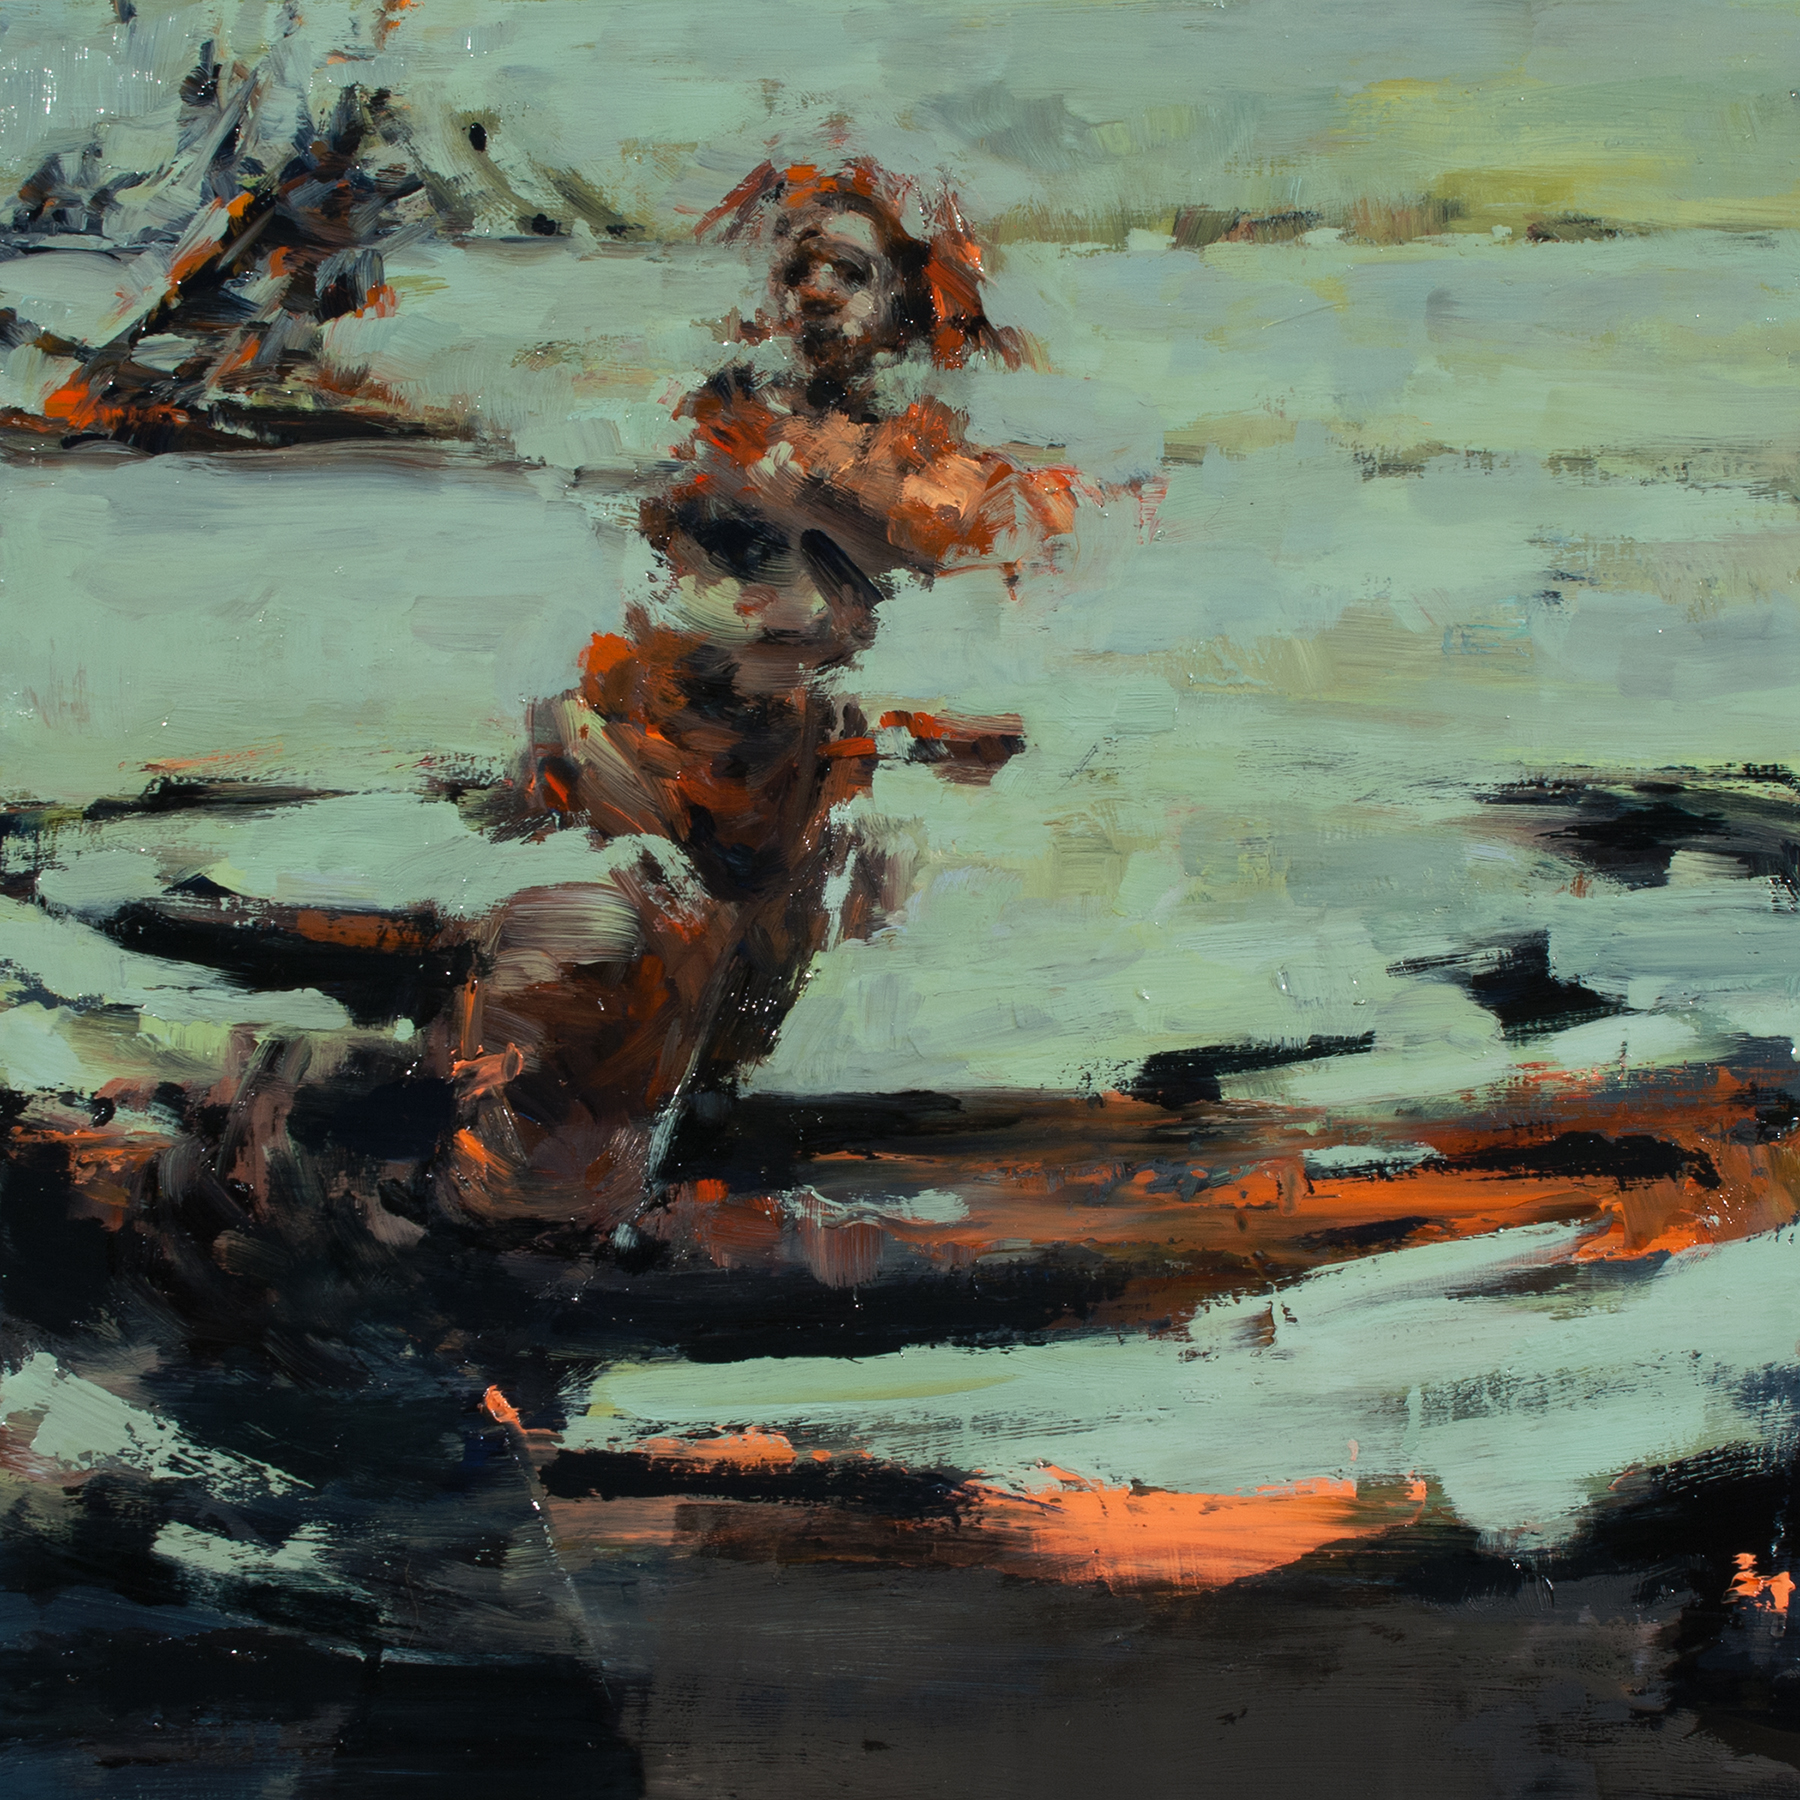 "Aftermath, oil on board, 12"" x 12"" x 2"", 2014"